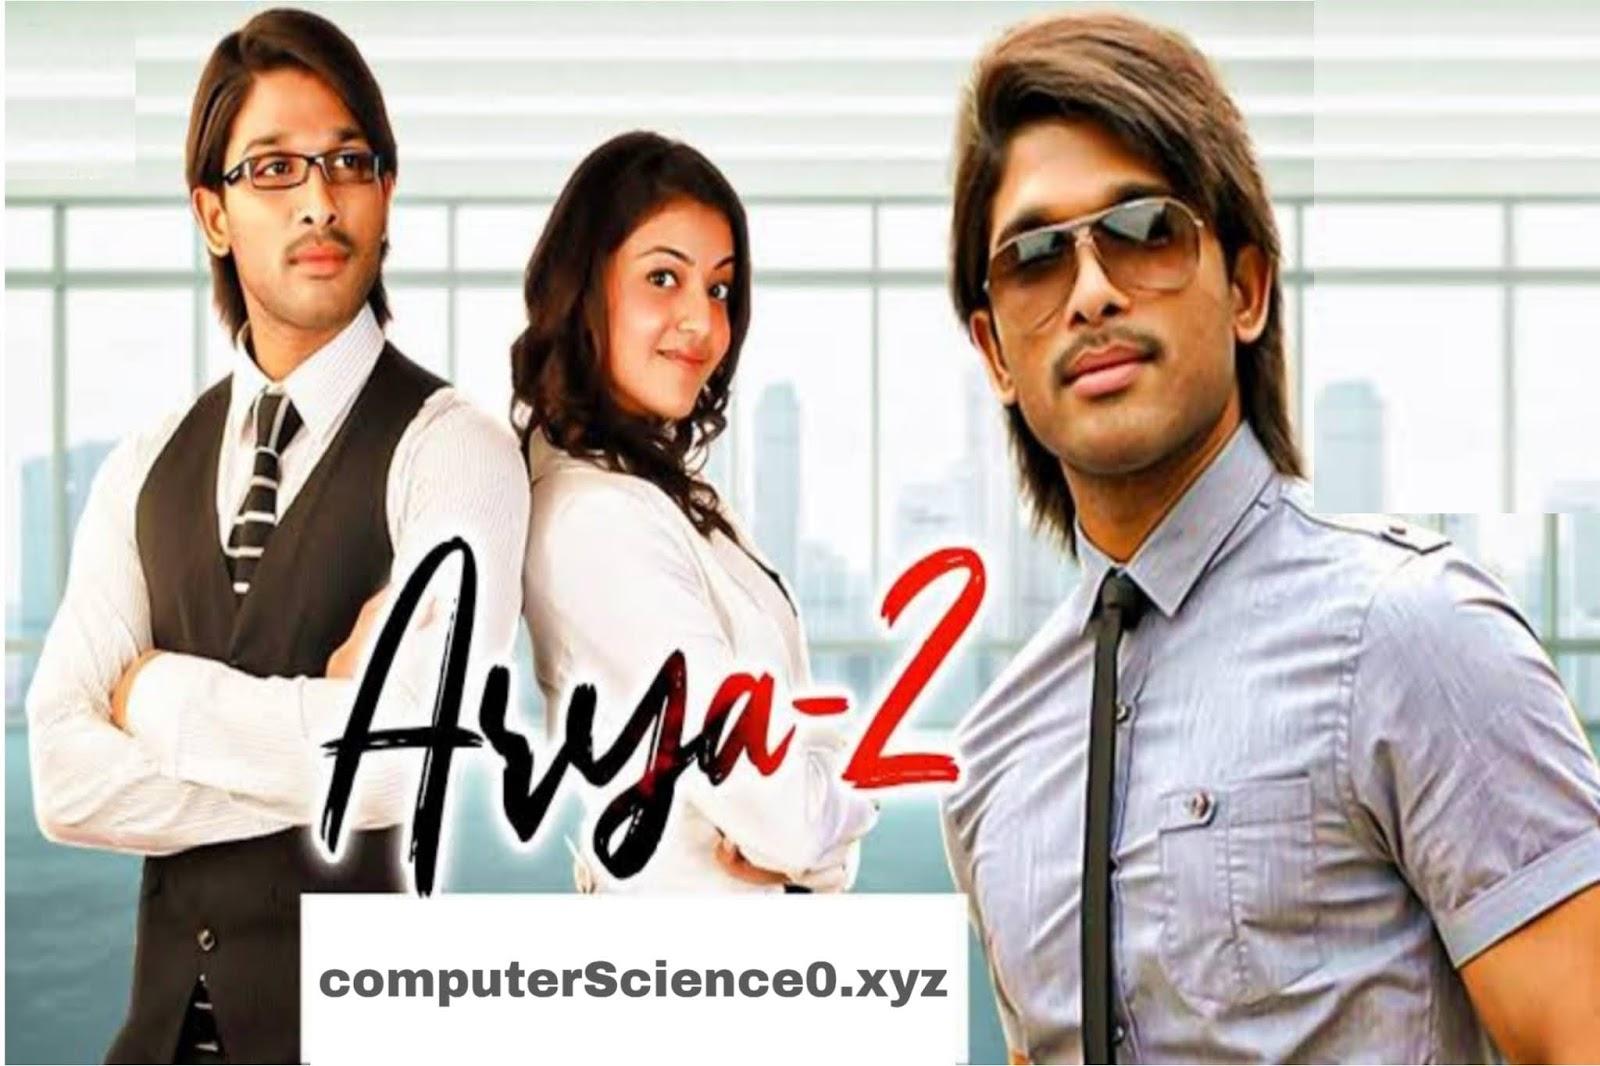 Arya 2 Allu Arjun's Top 19 movies of all time